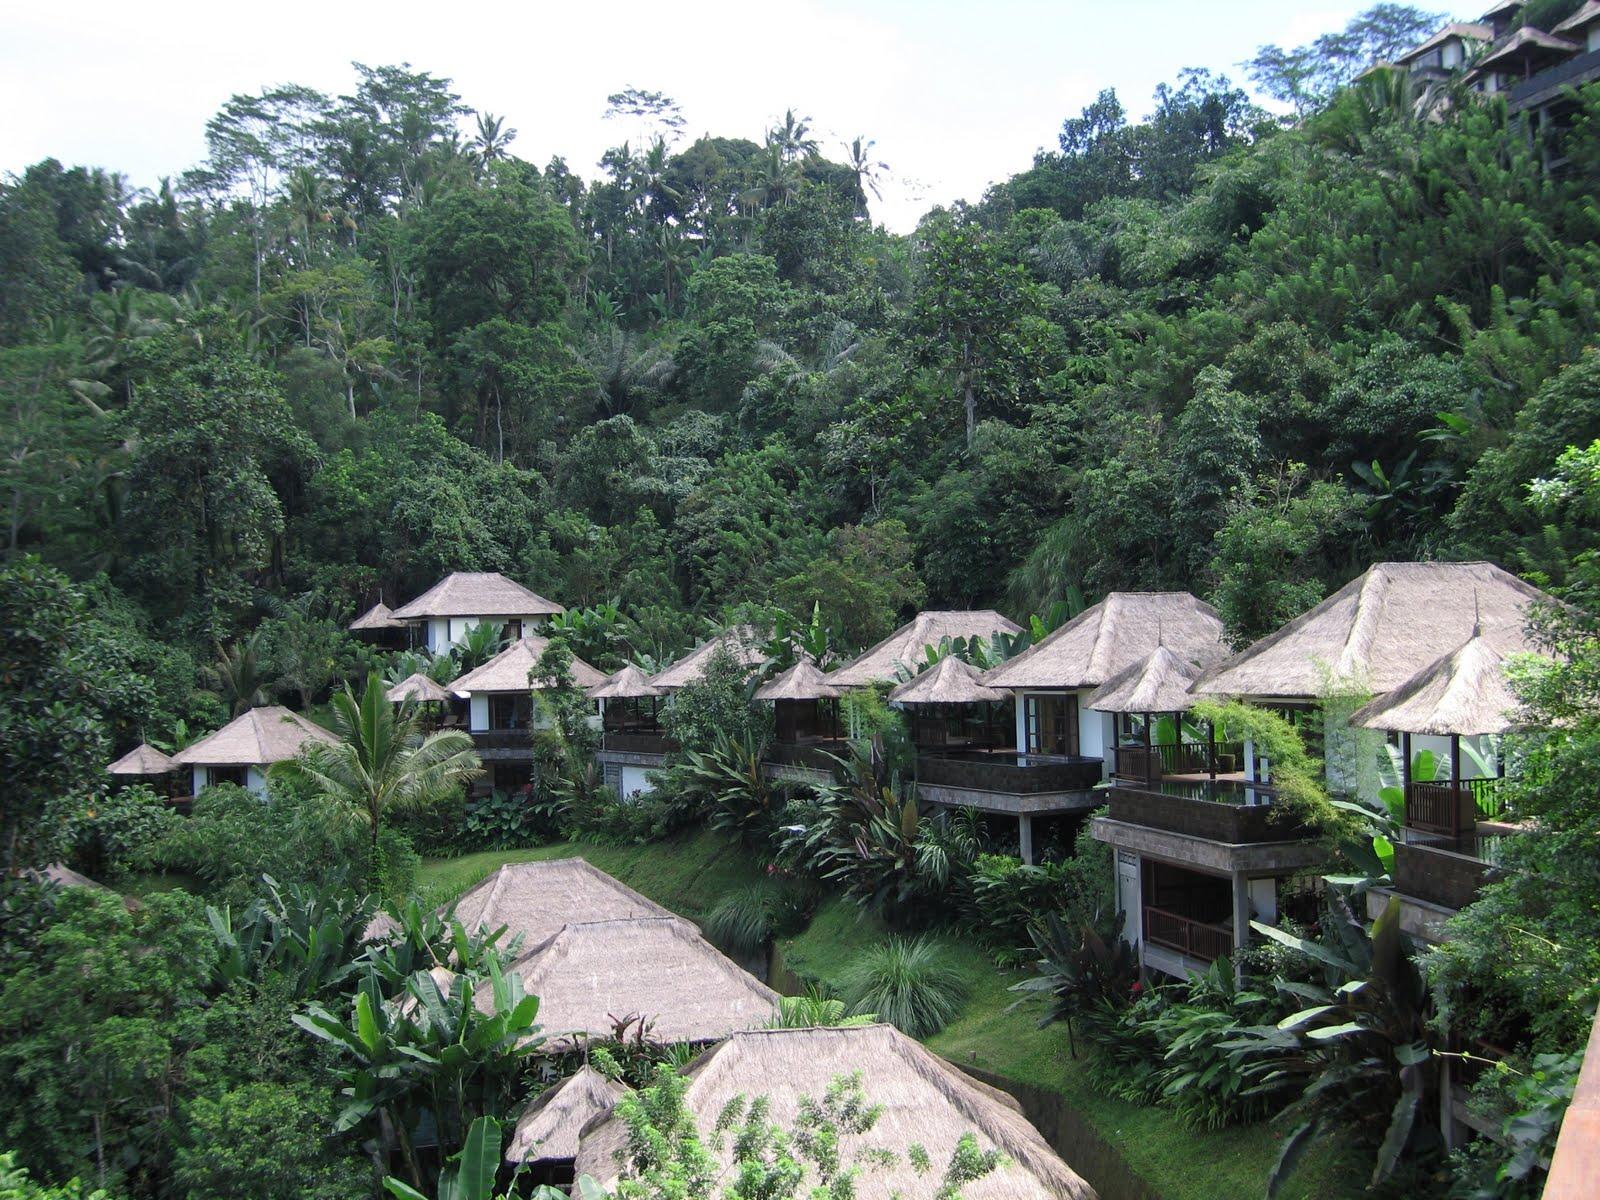 ubud hanging gardens - Ubud Hanging Gardens Bali Indonesia